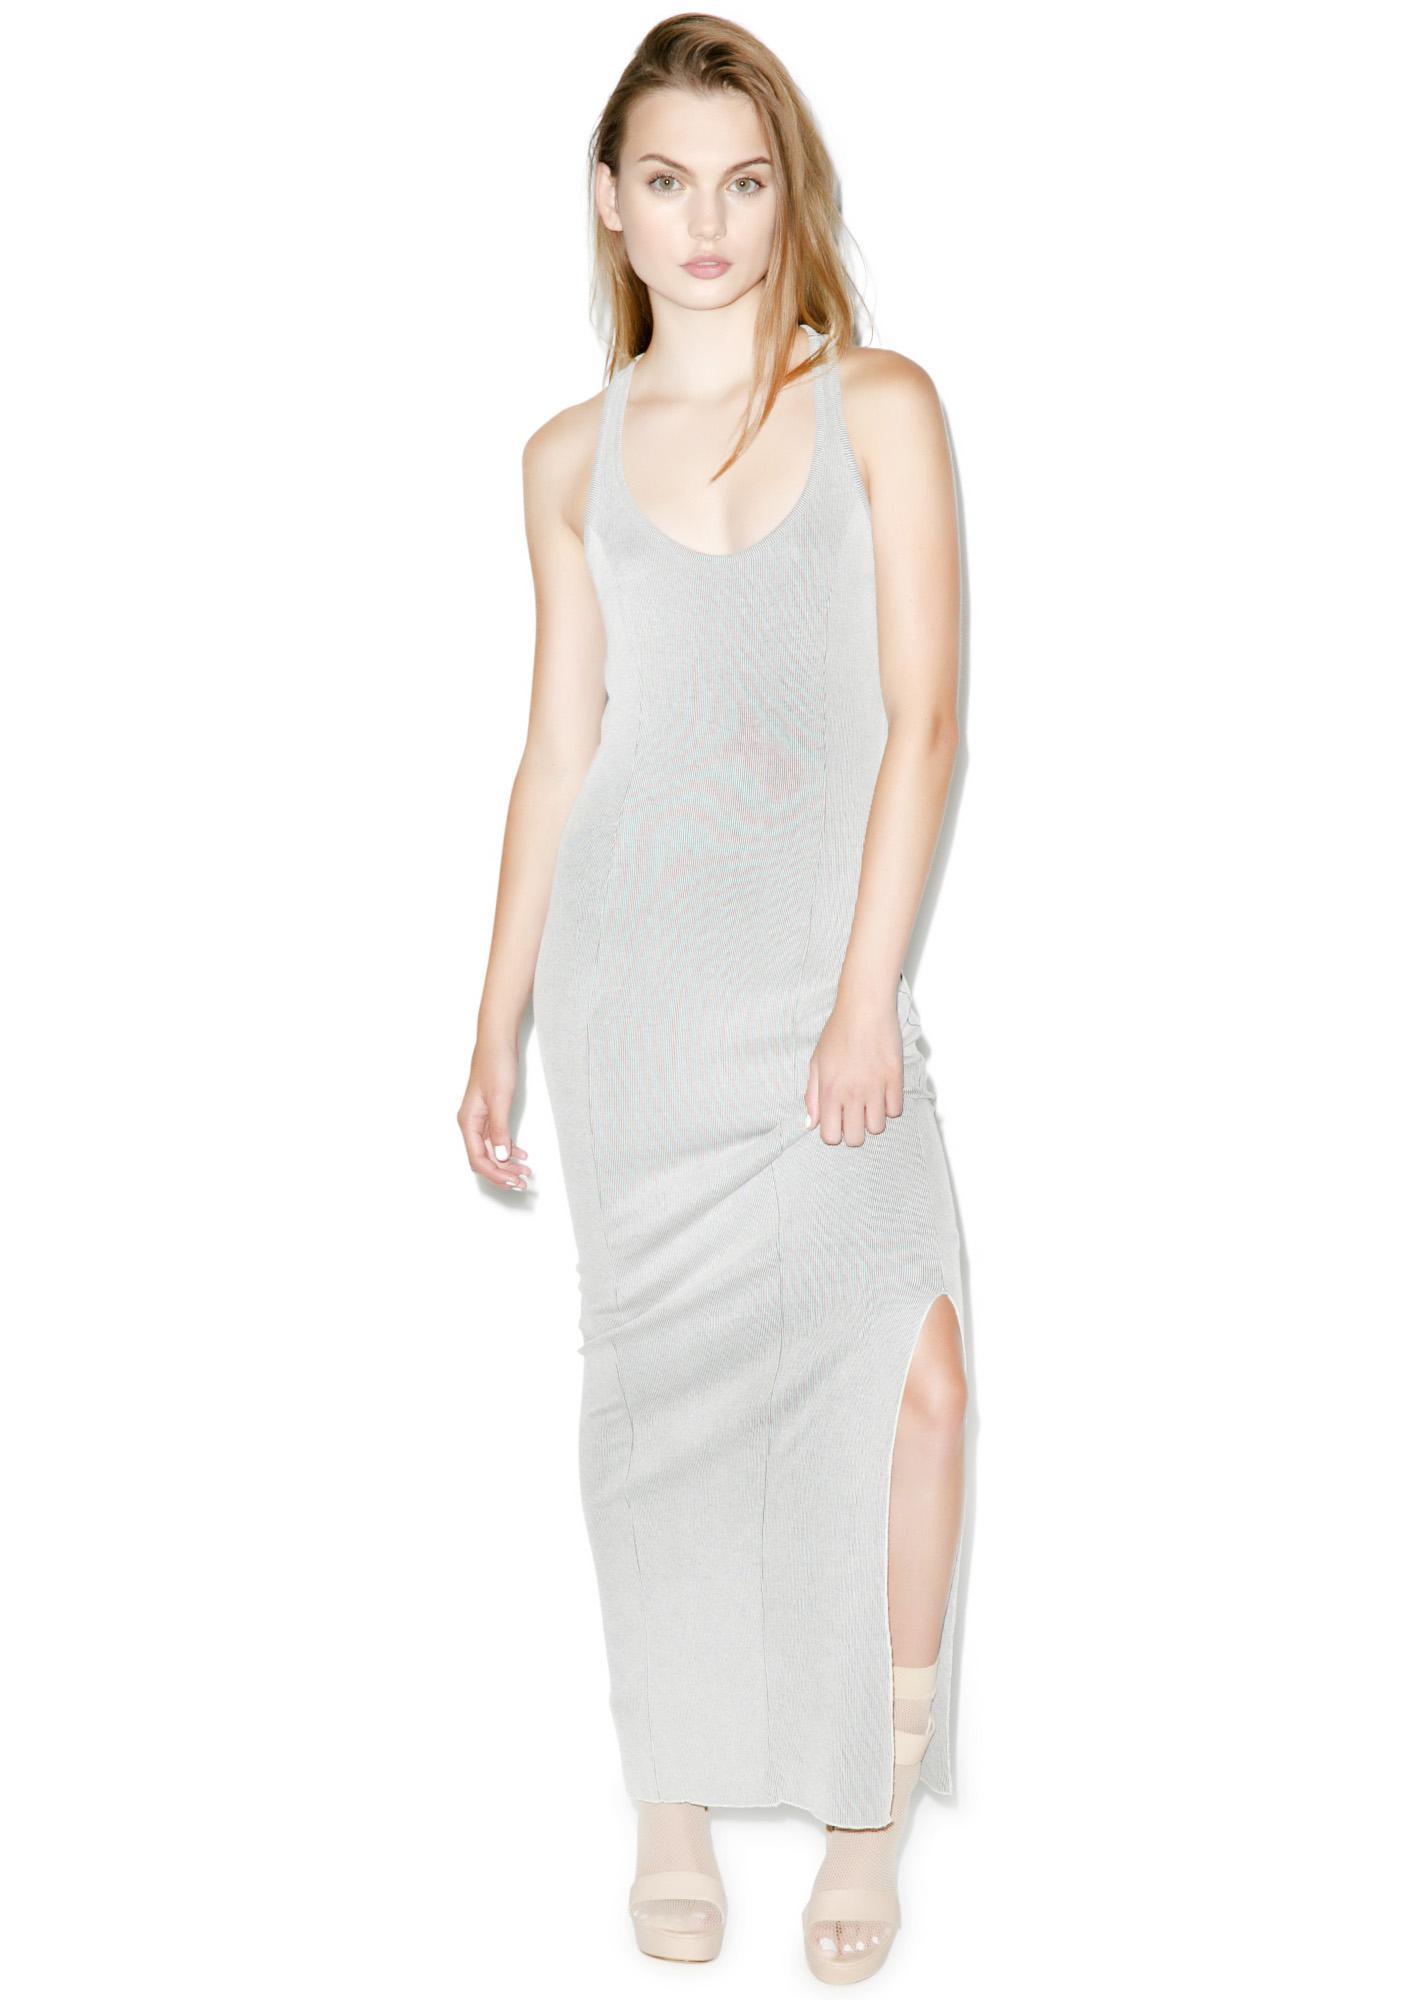 CSBLA Bari Racerback Dress